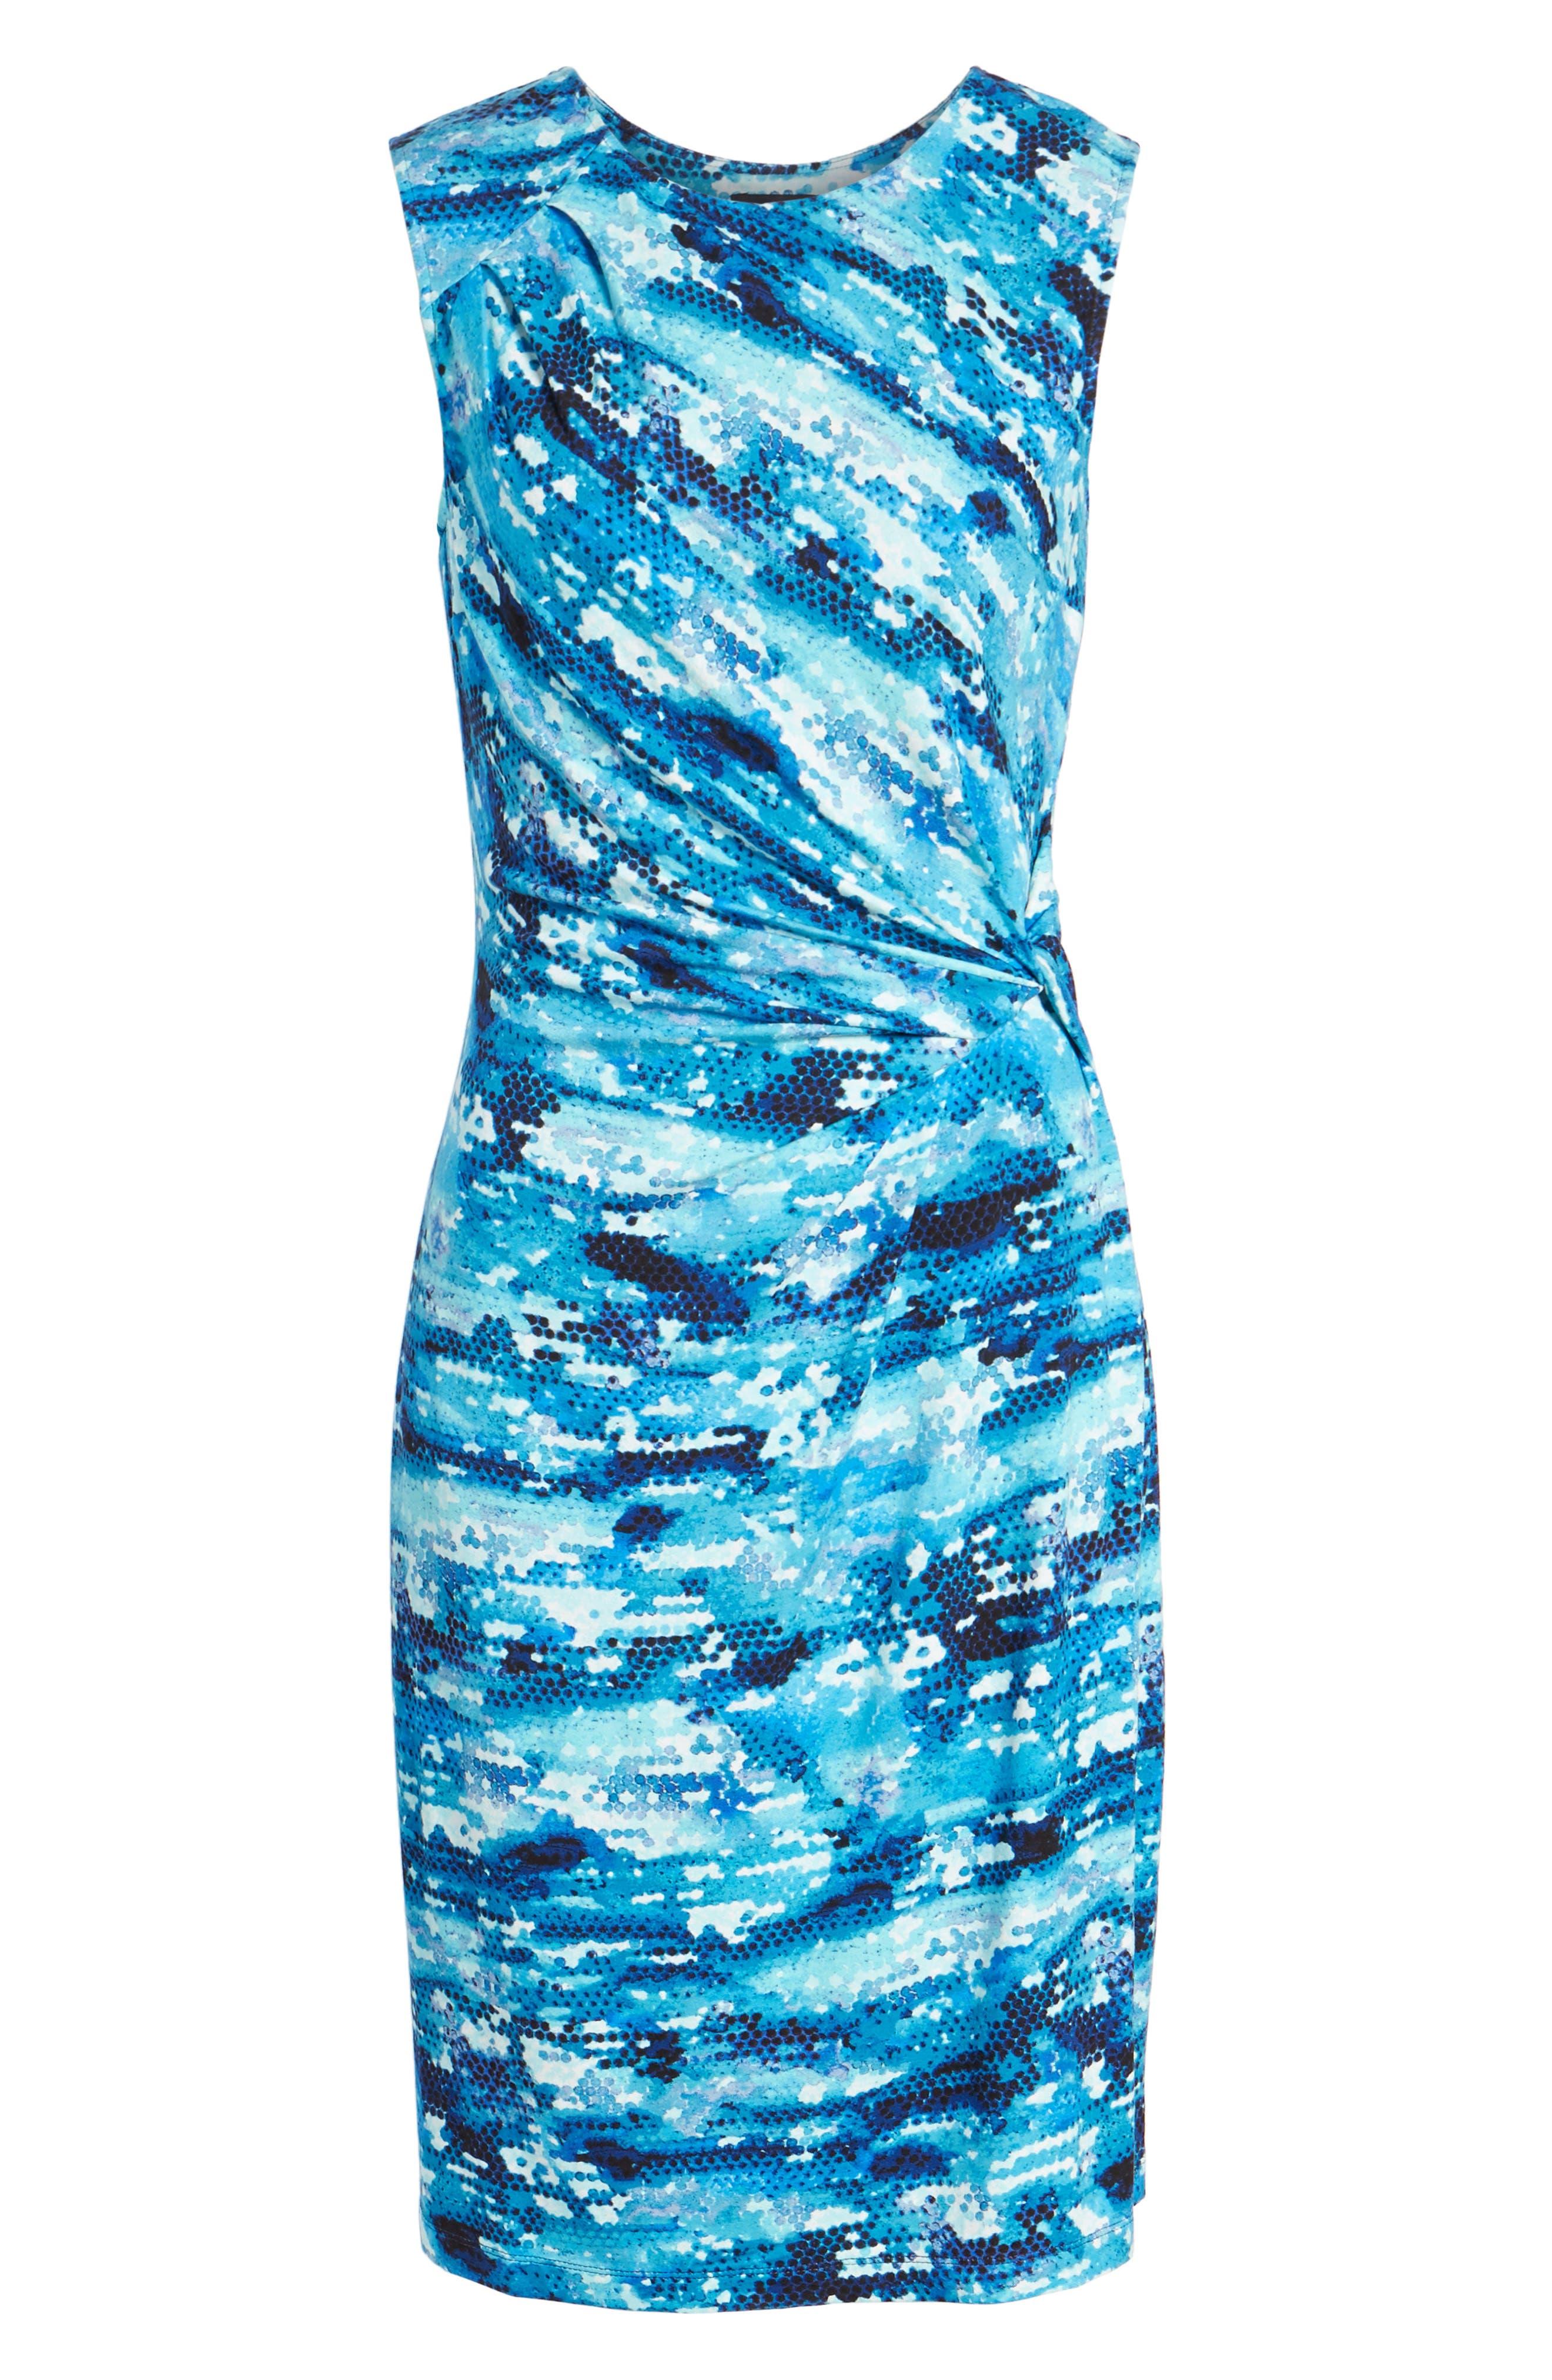 Surf Spray Sheath Dress,                             Alternate thumbnail 6, color,                             490